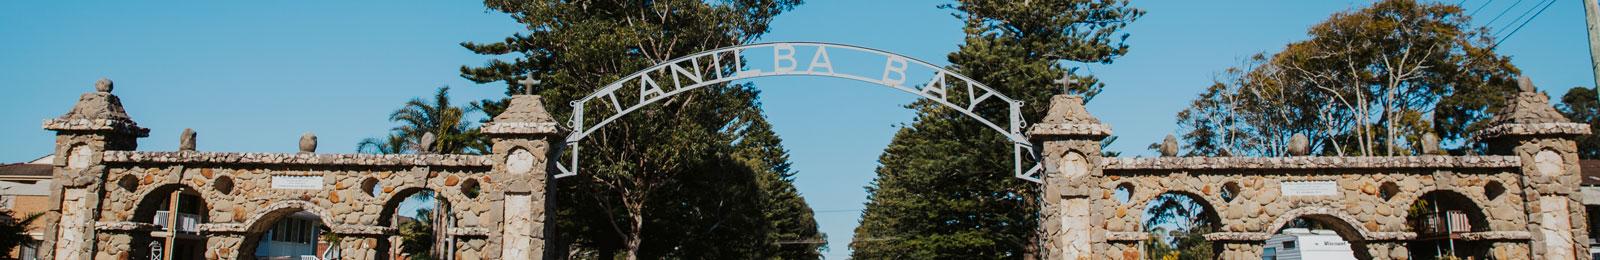 Tanilba Bay's Centenary Gate